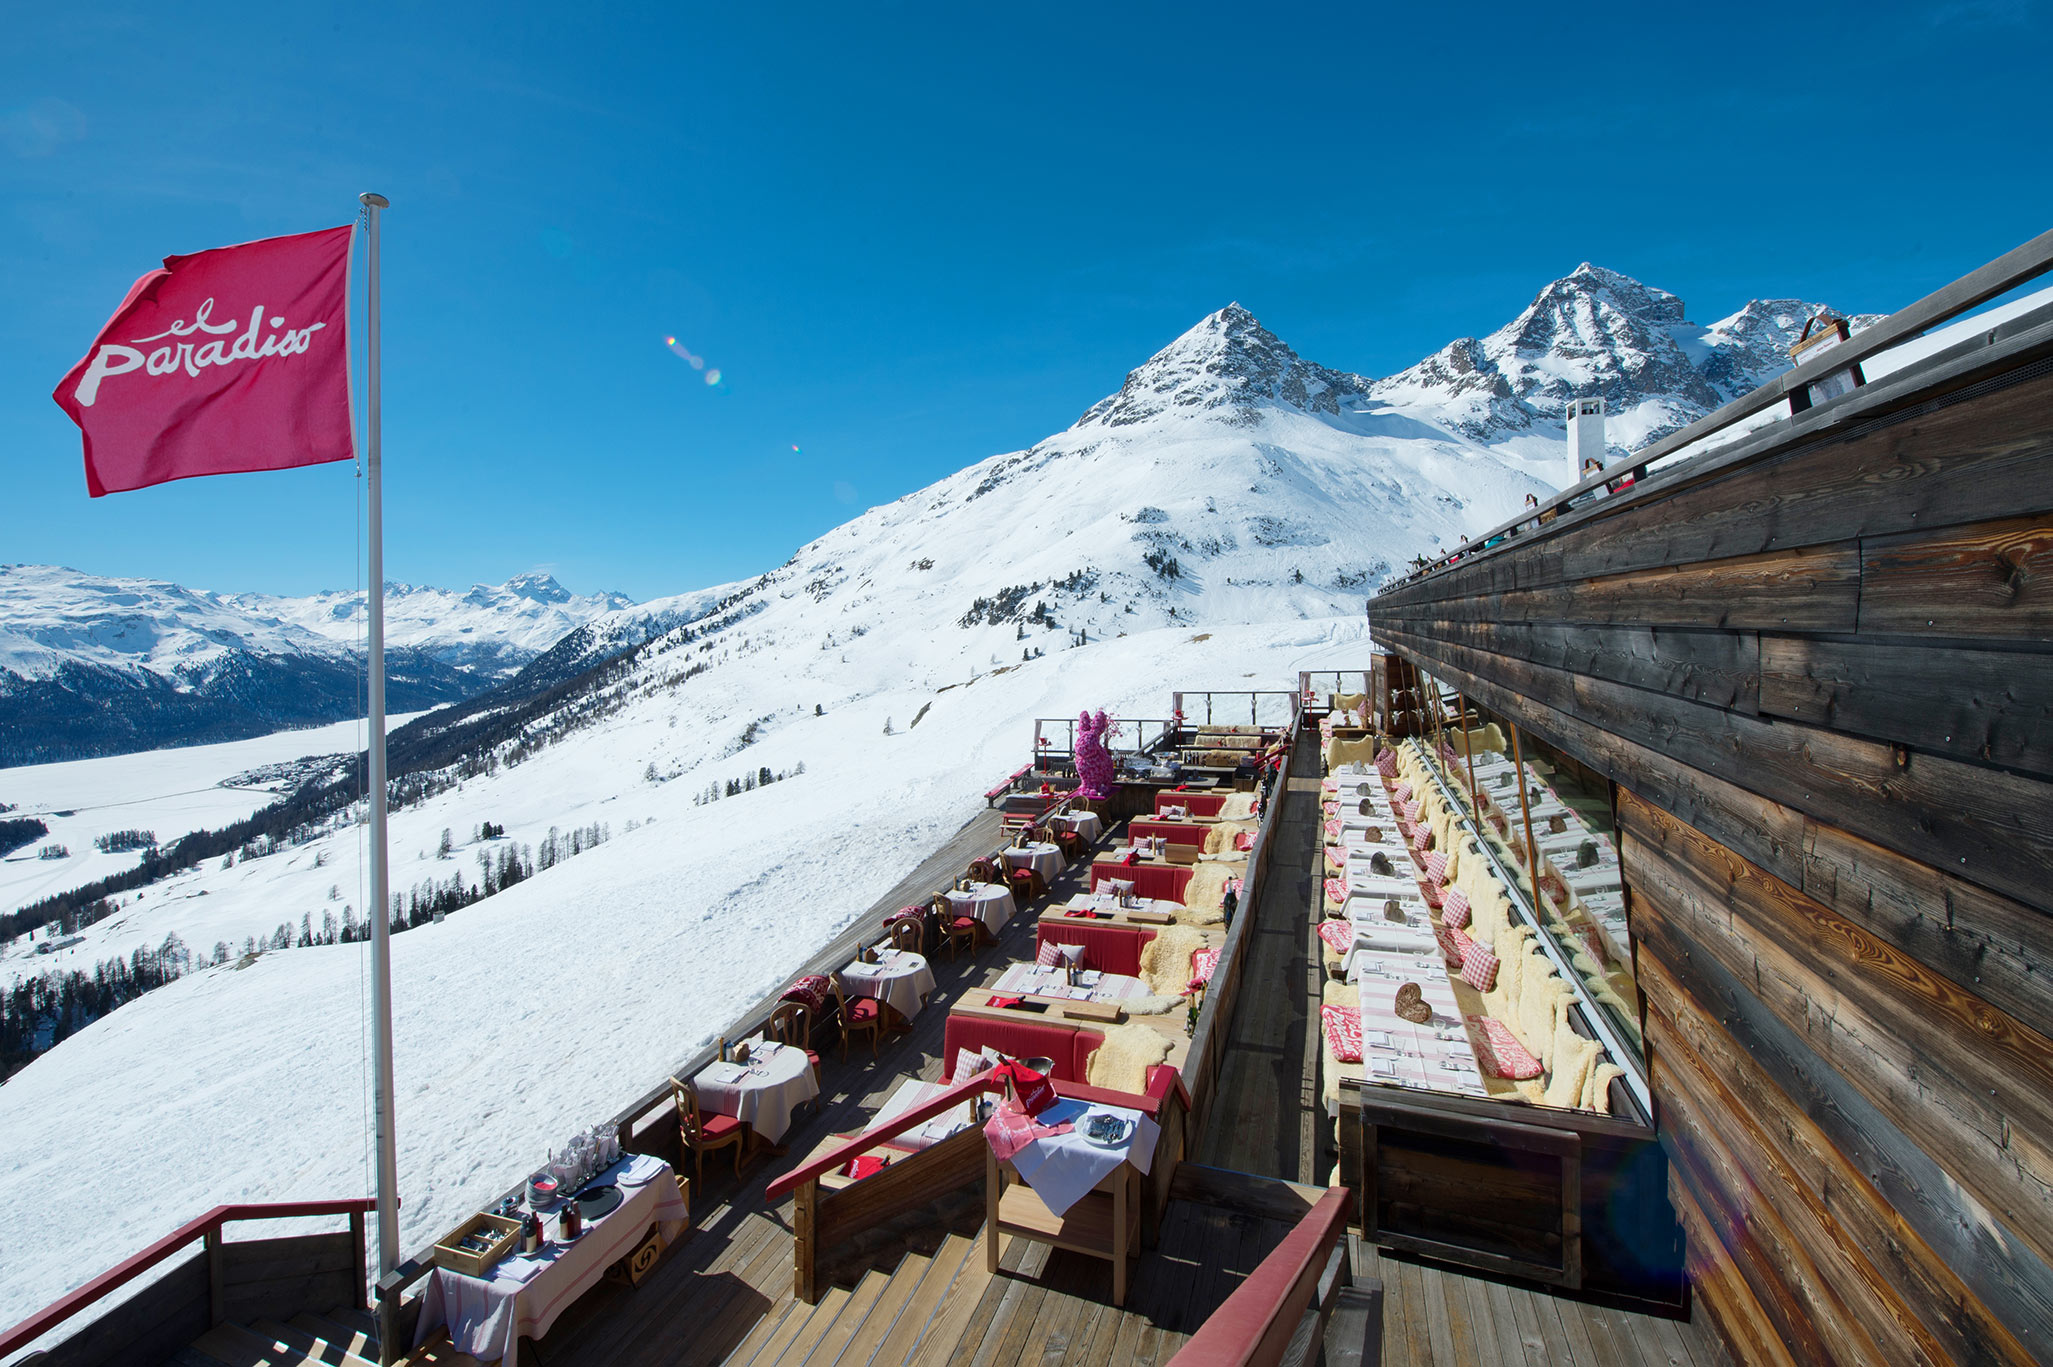 elparadiso-winter-club-terrace-3.jpg